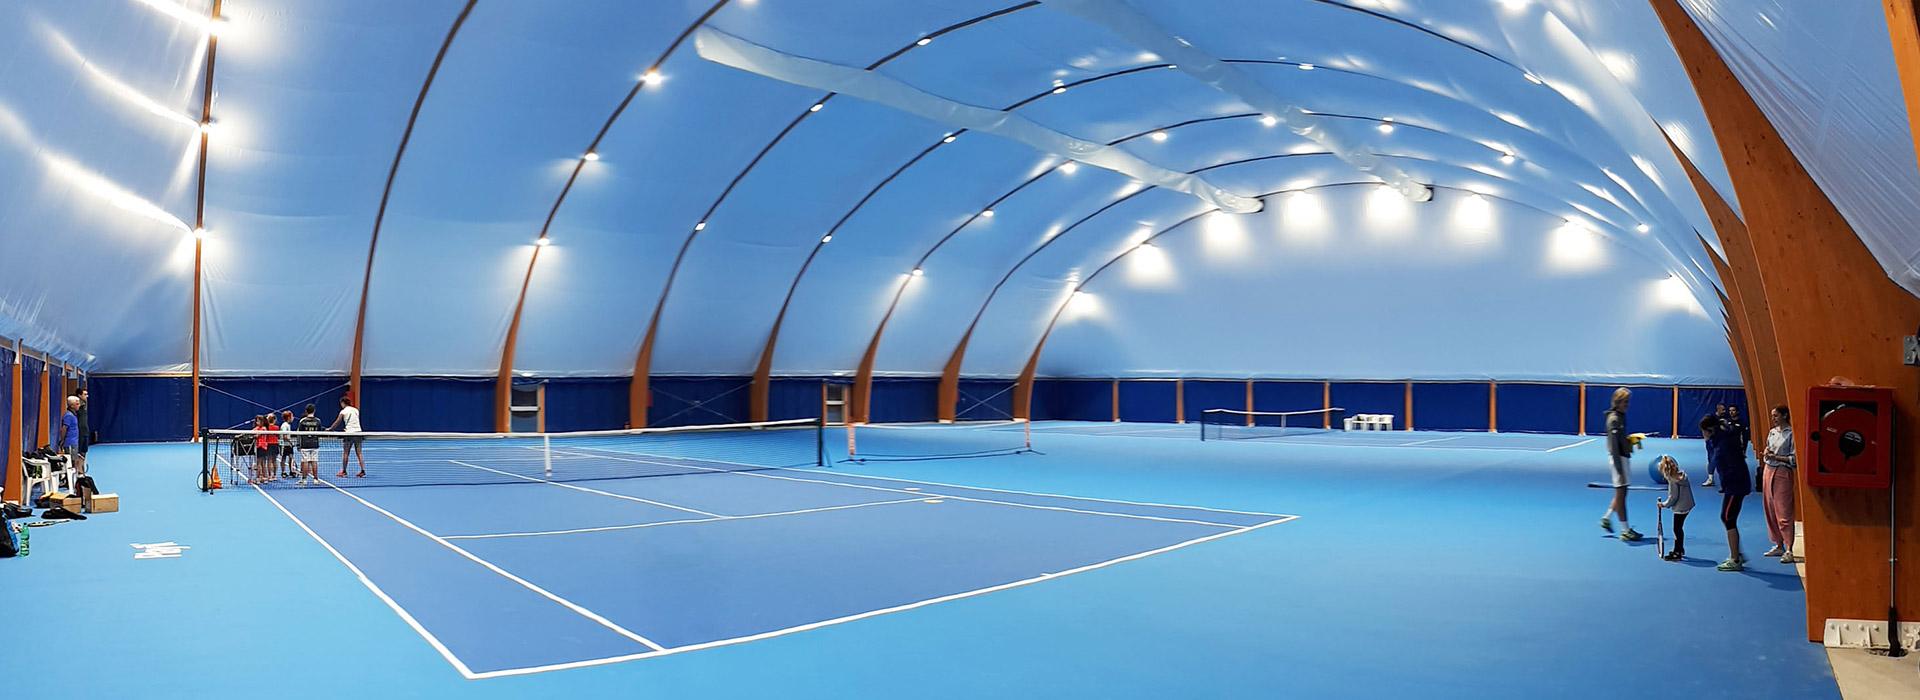 The Oltrepò Tennis Academy